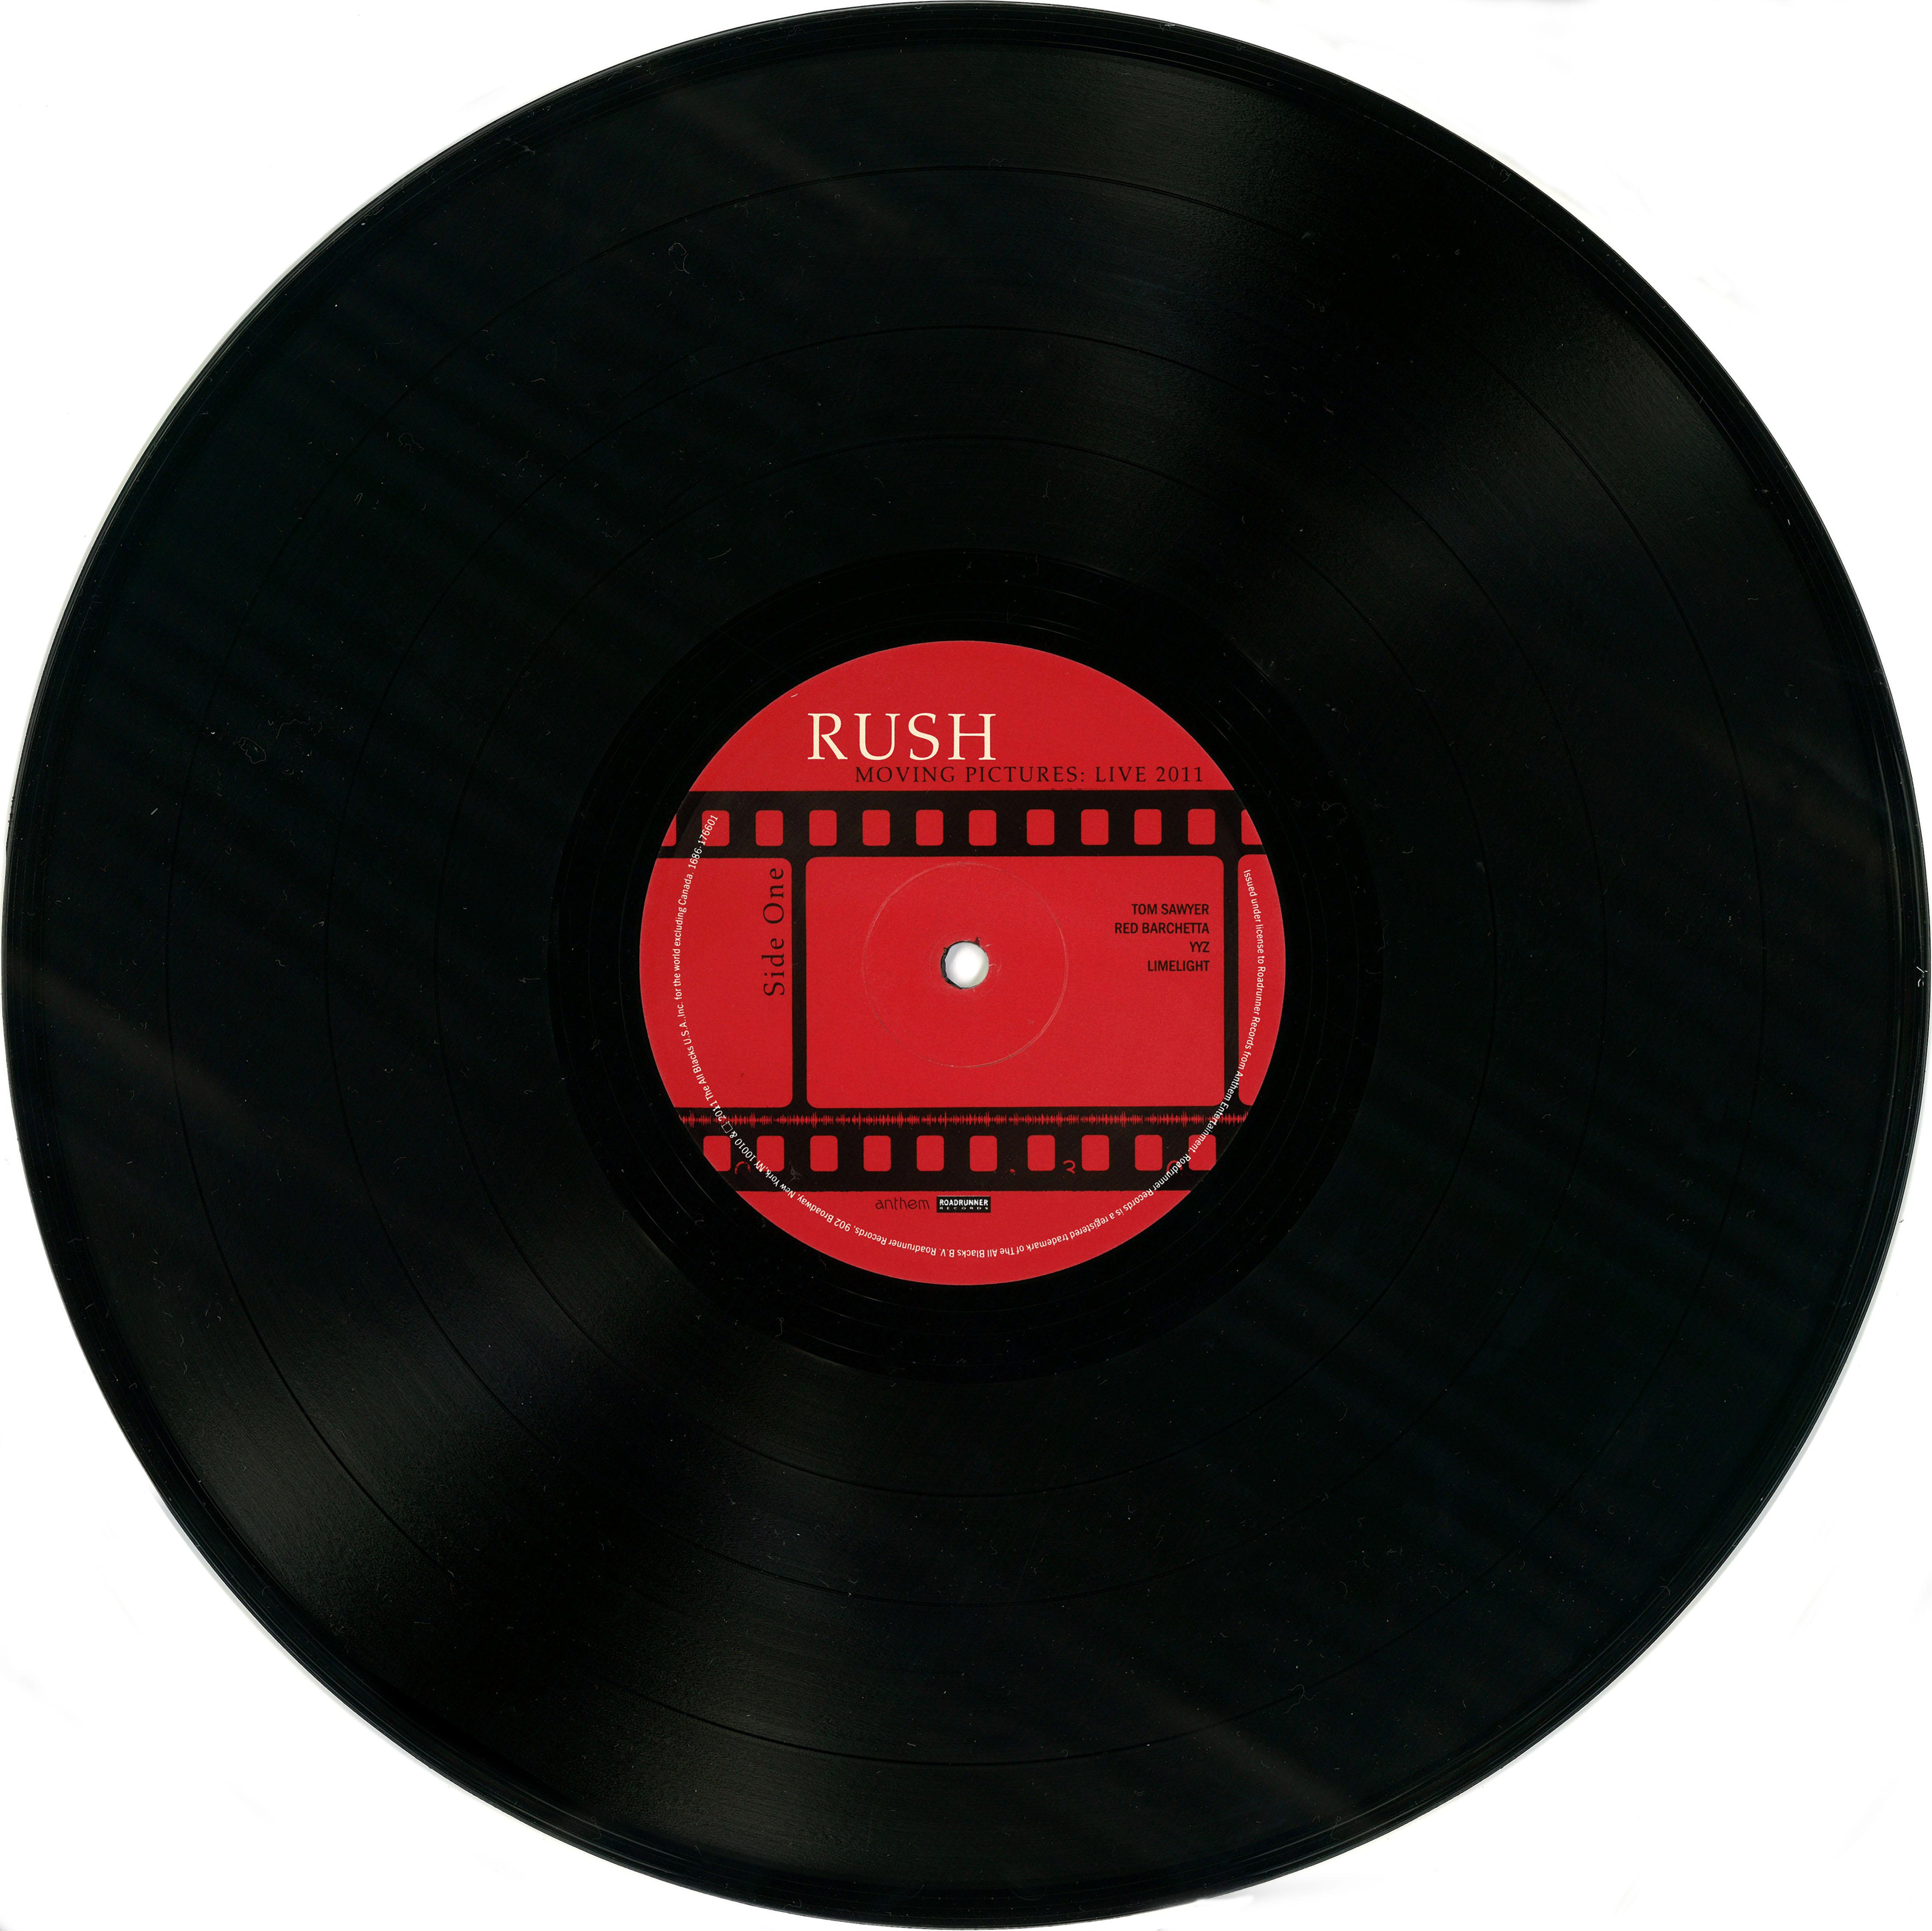 rush moving pictures live 2011 album artwork. Black Bedroom Furniture Sets. Home Design Ideas